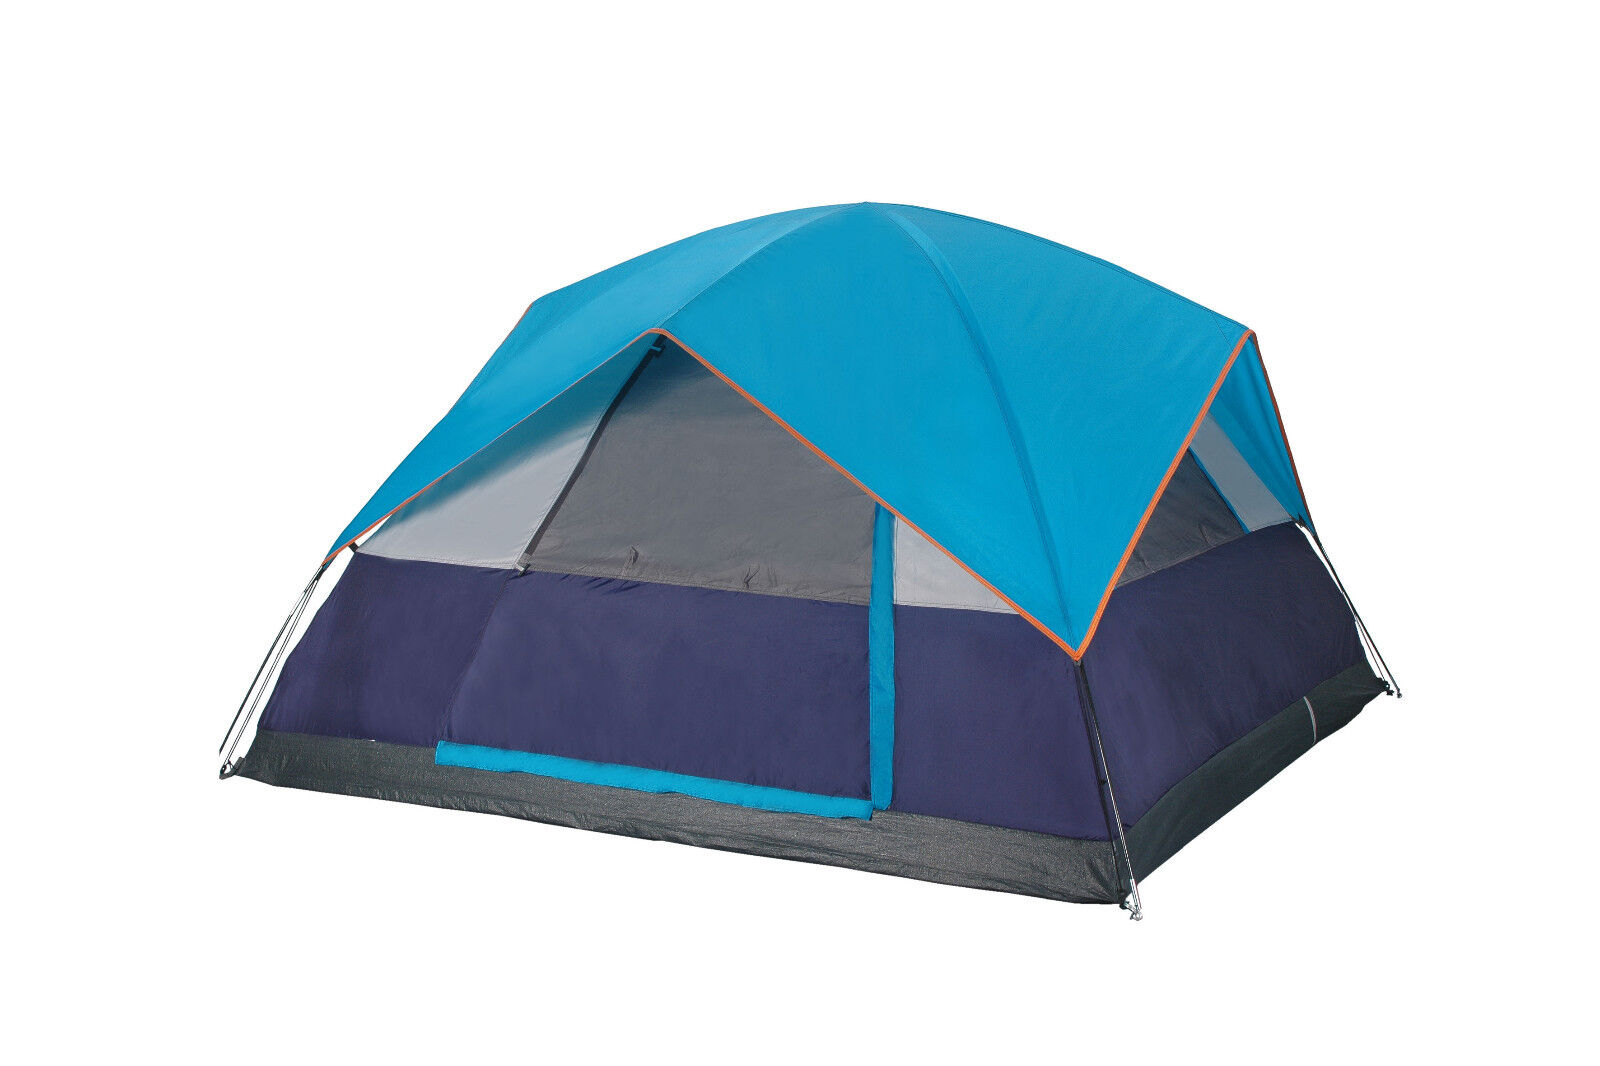 Camping Tent Sleeps 4 Mt64 Garfield  8' x 8' de plein airs  Emergency